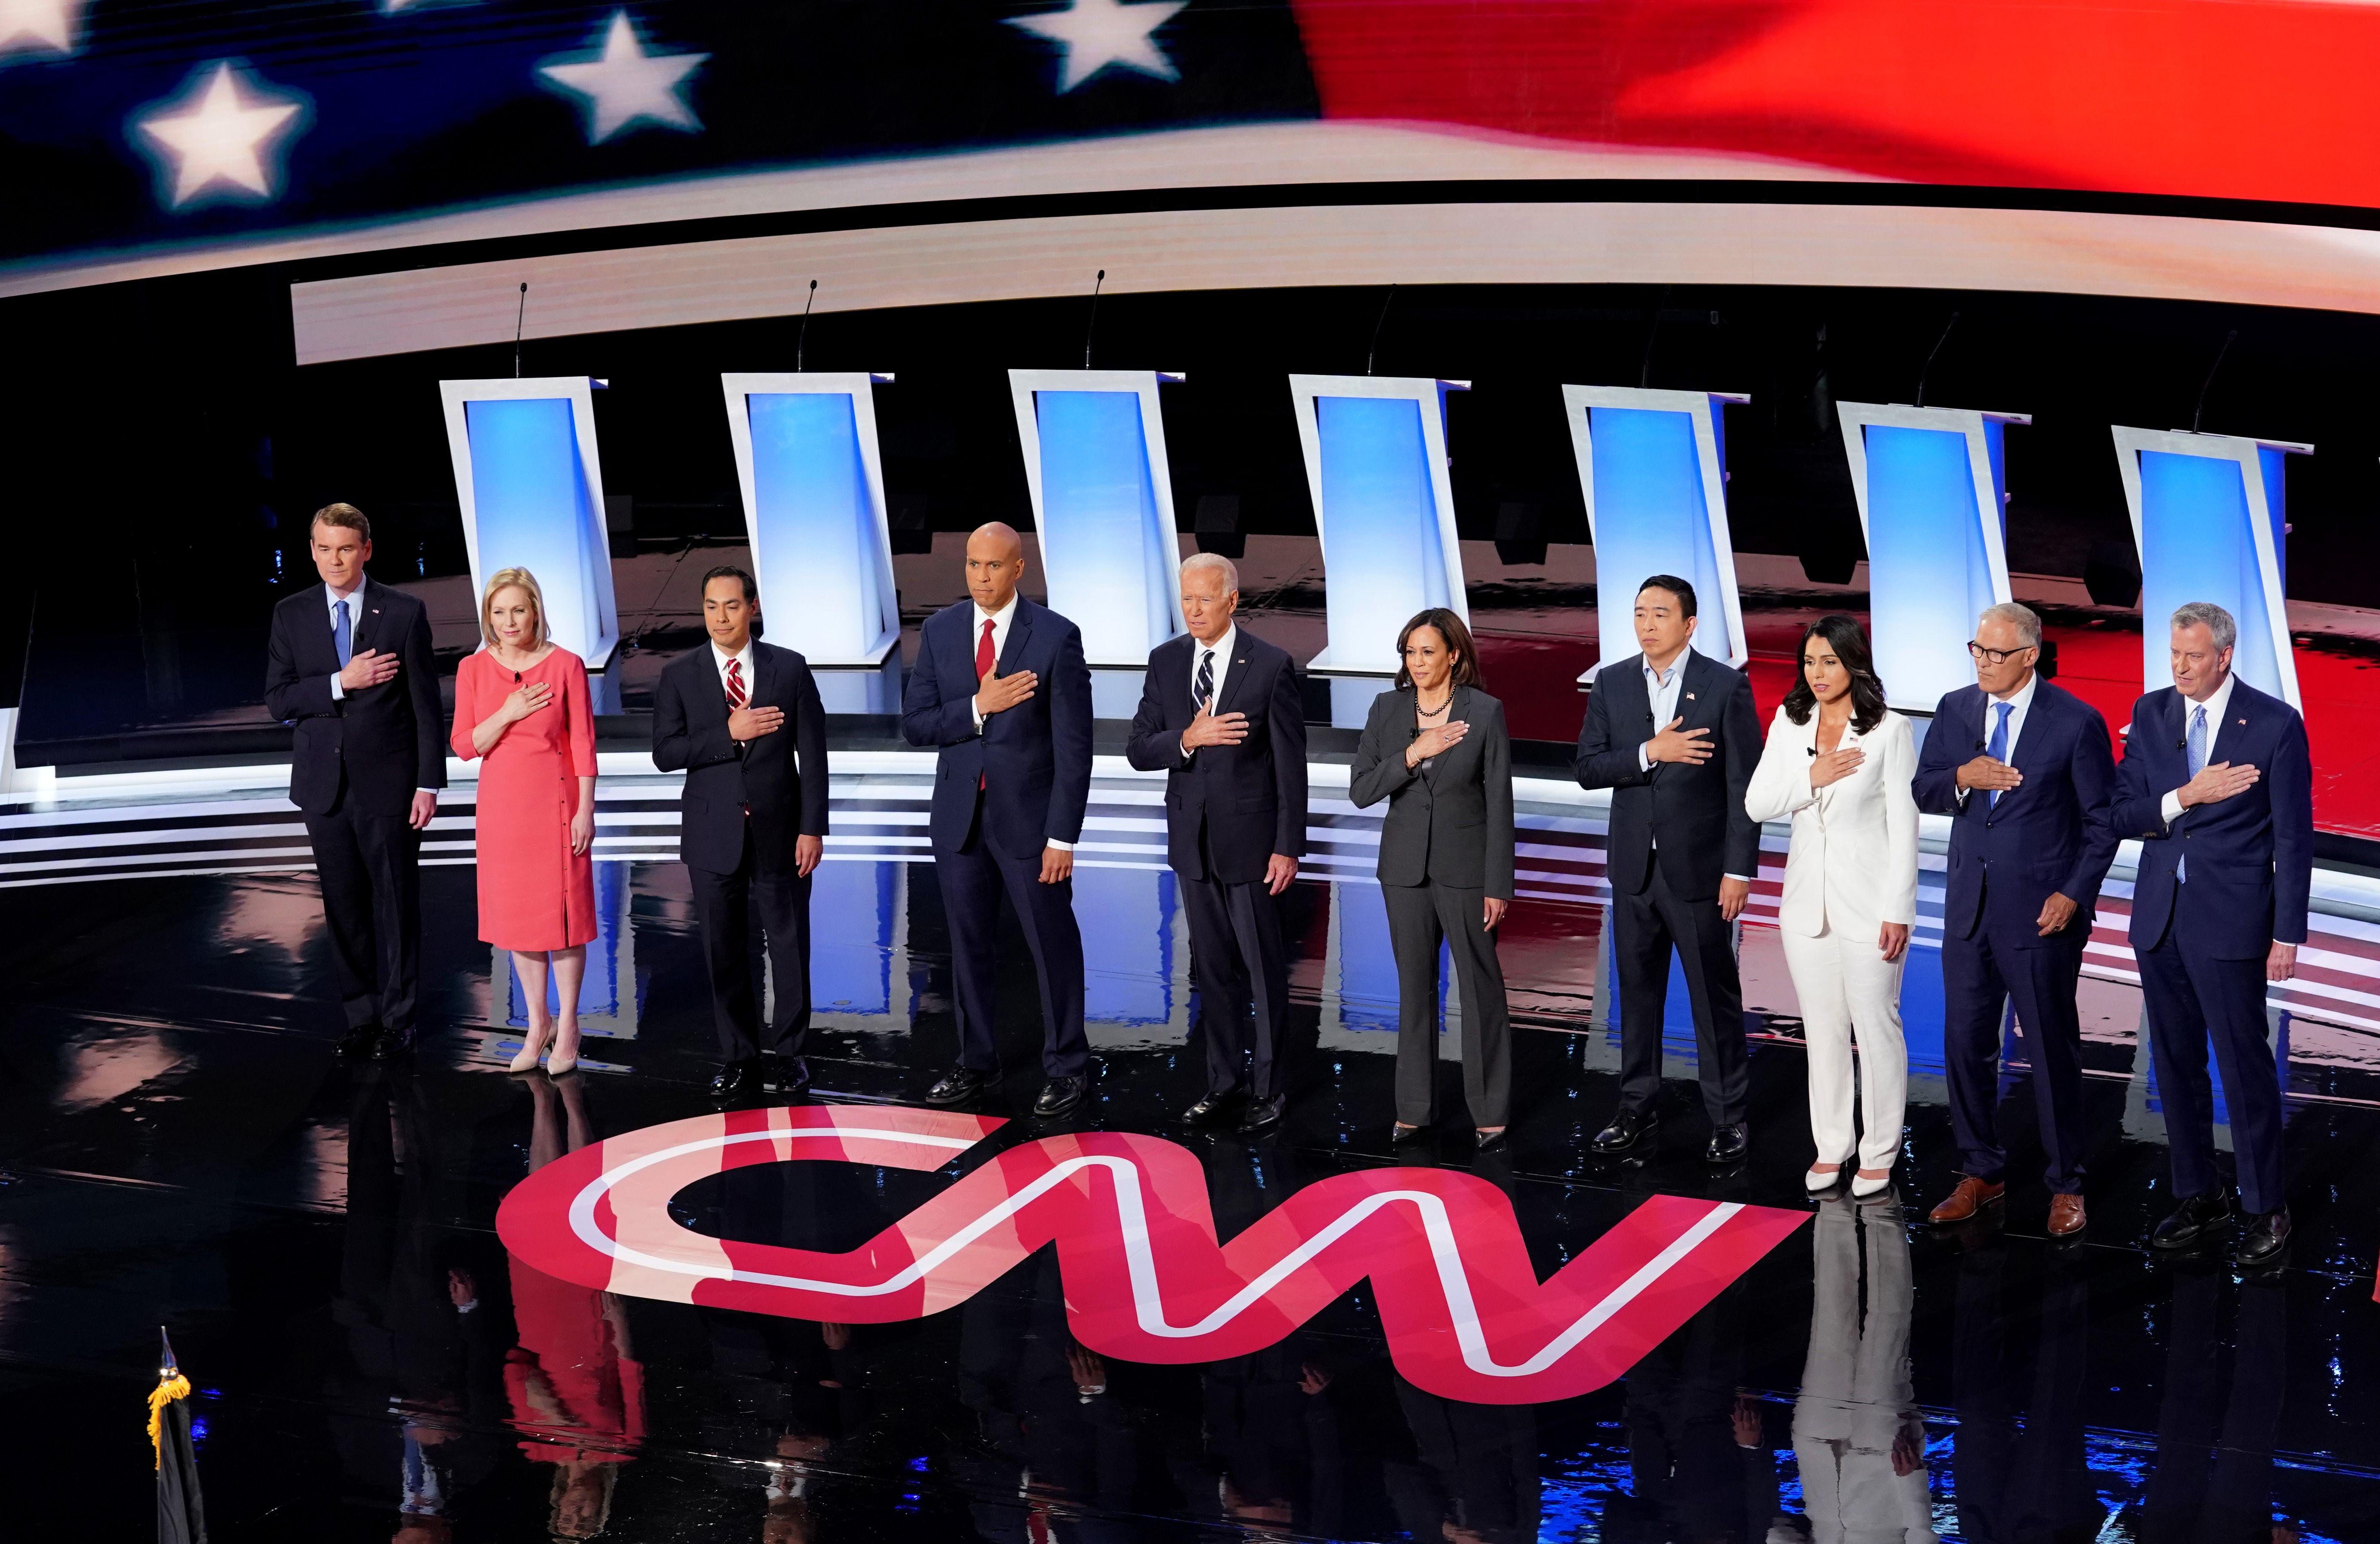 6 Takeaways From Night Two of CNN's Democratic Debates